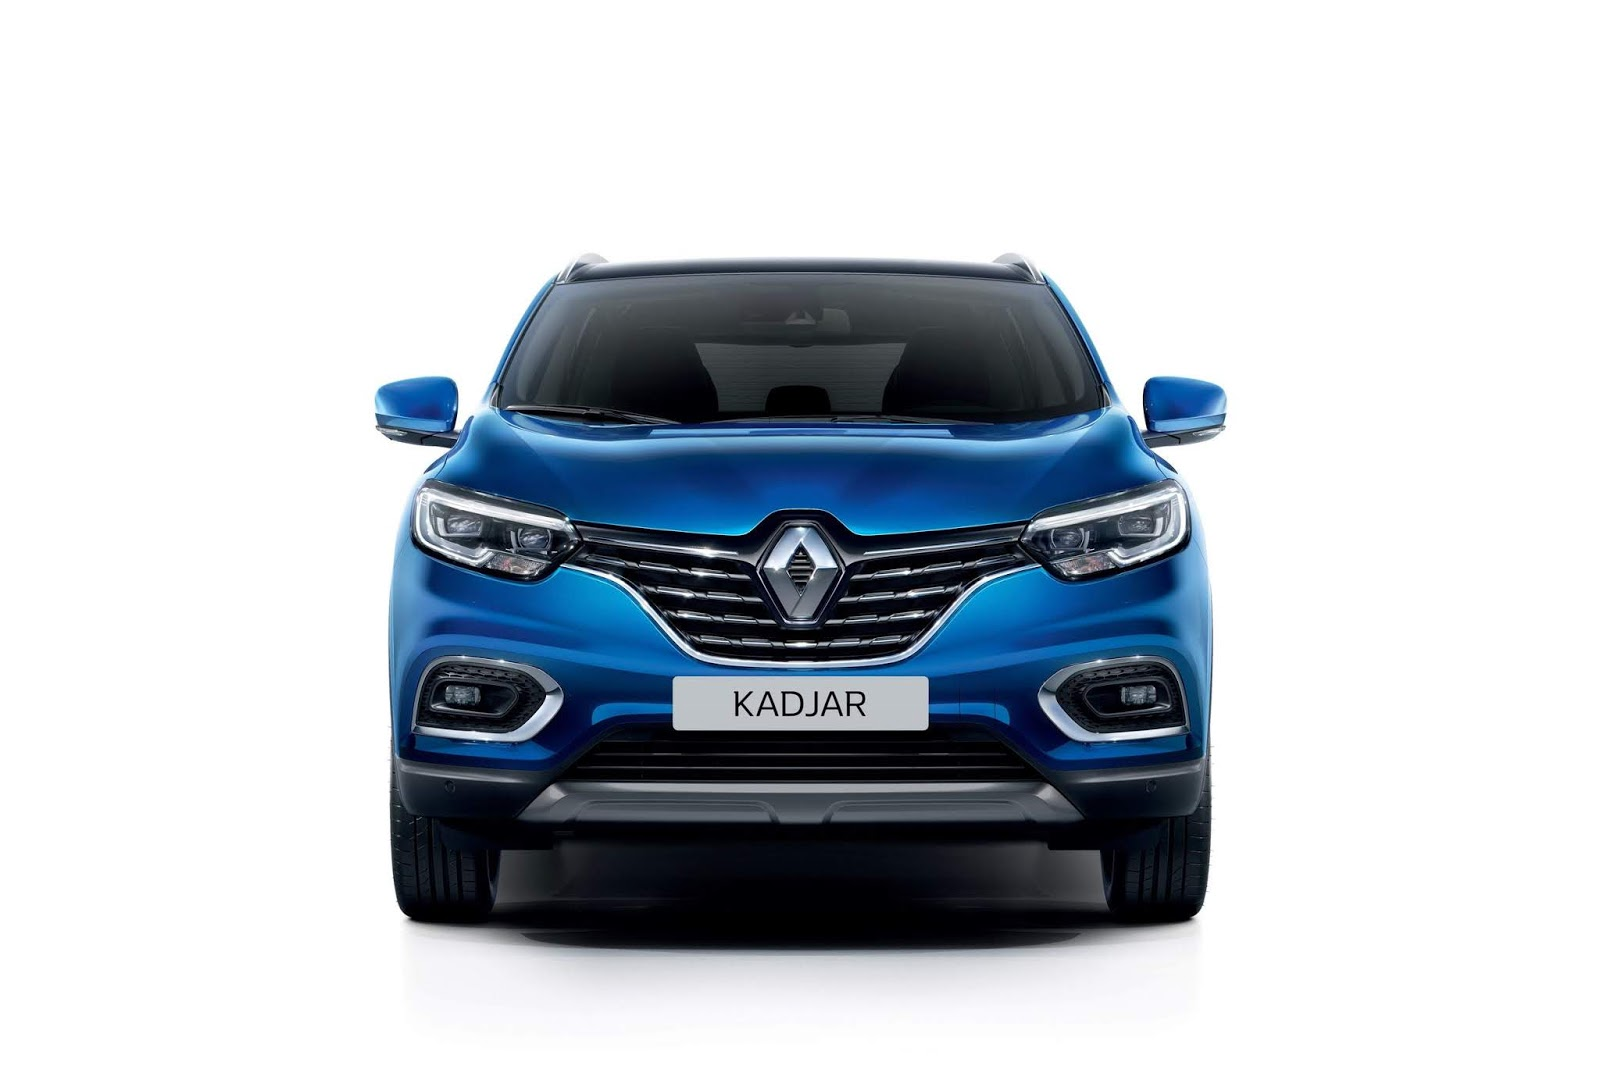 New Renault KADJAR2B5 low Την άνοιξη στην Ελλάδα το νέο Renault Kadjar Renault, Renault Kadjar